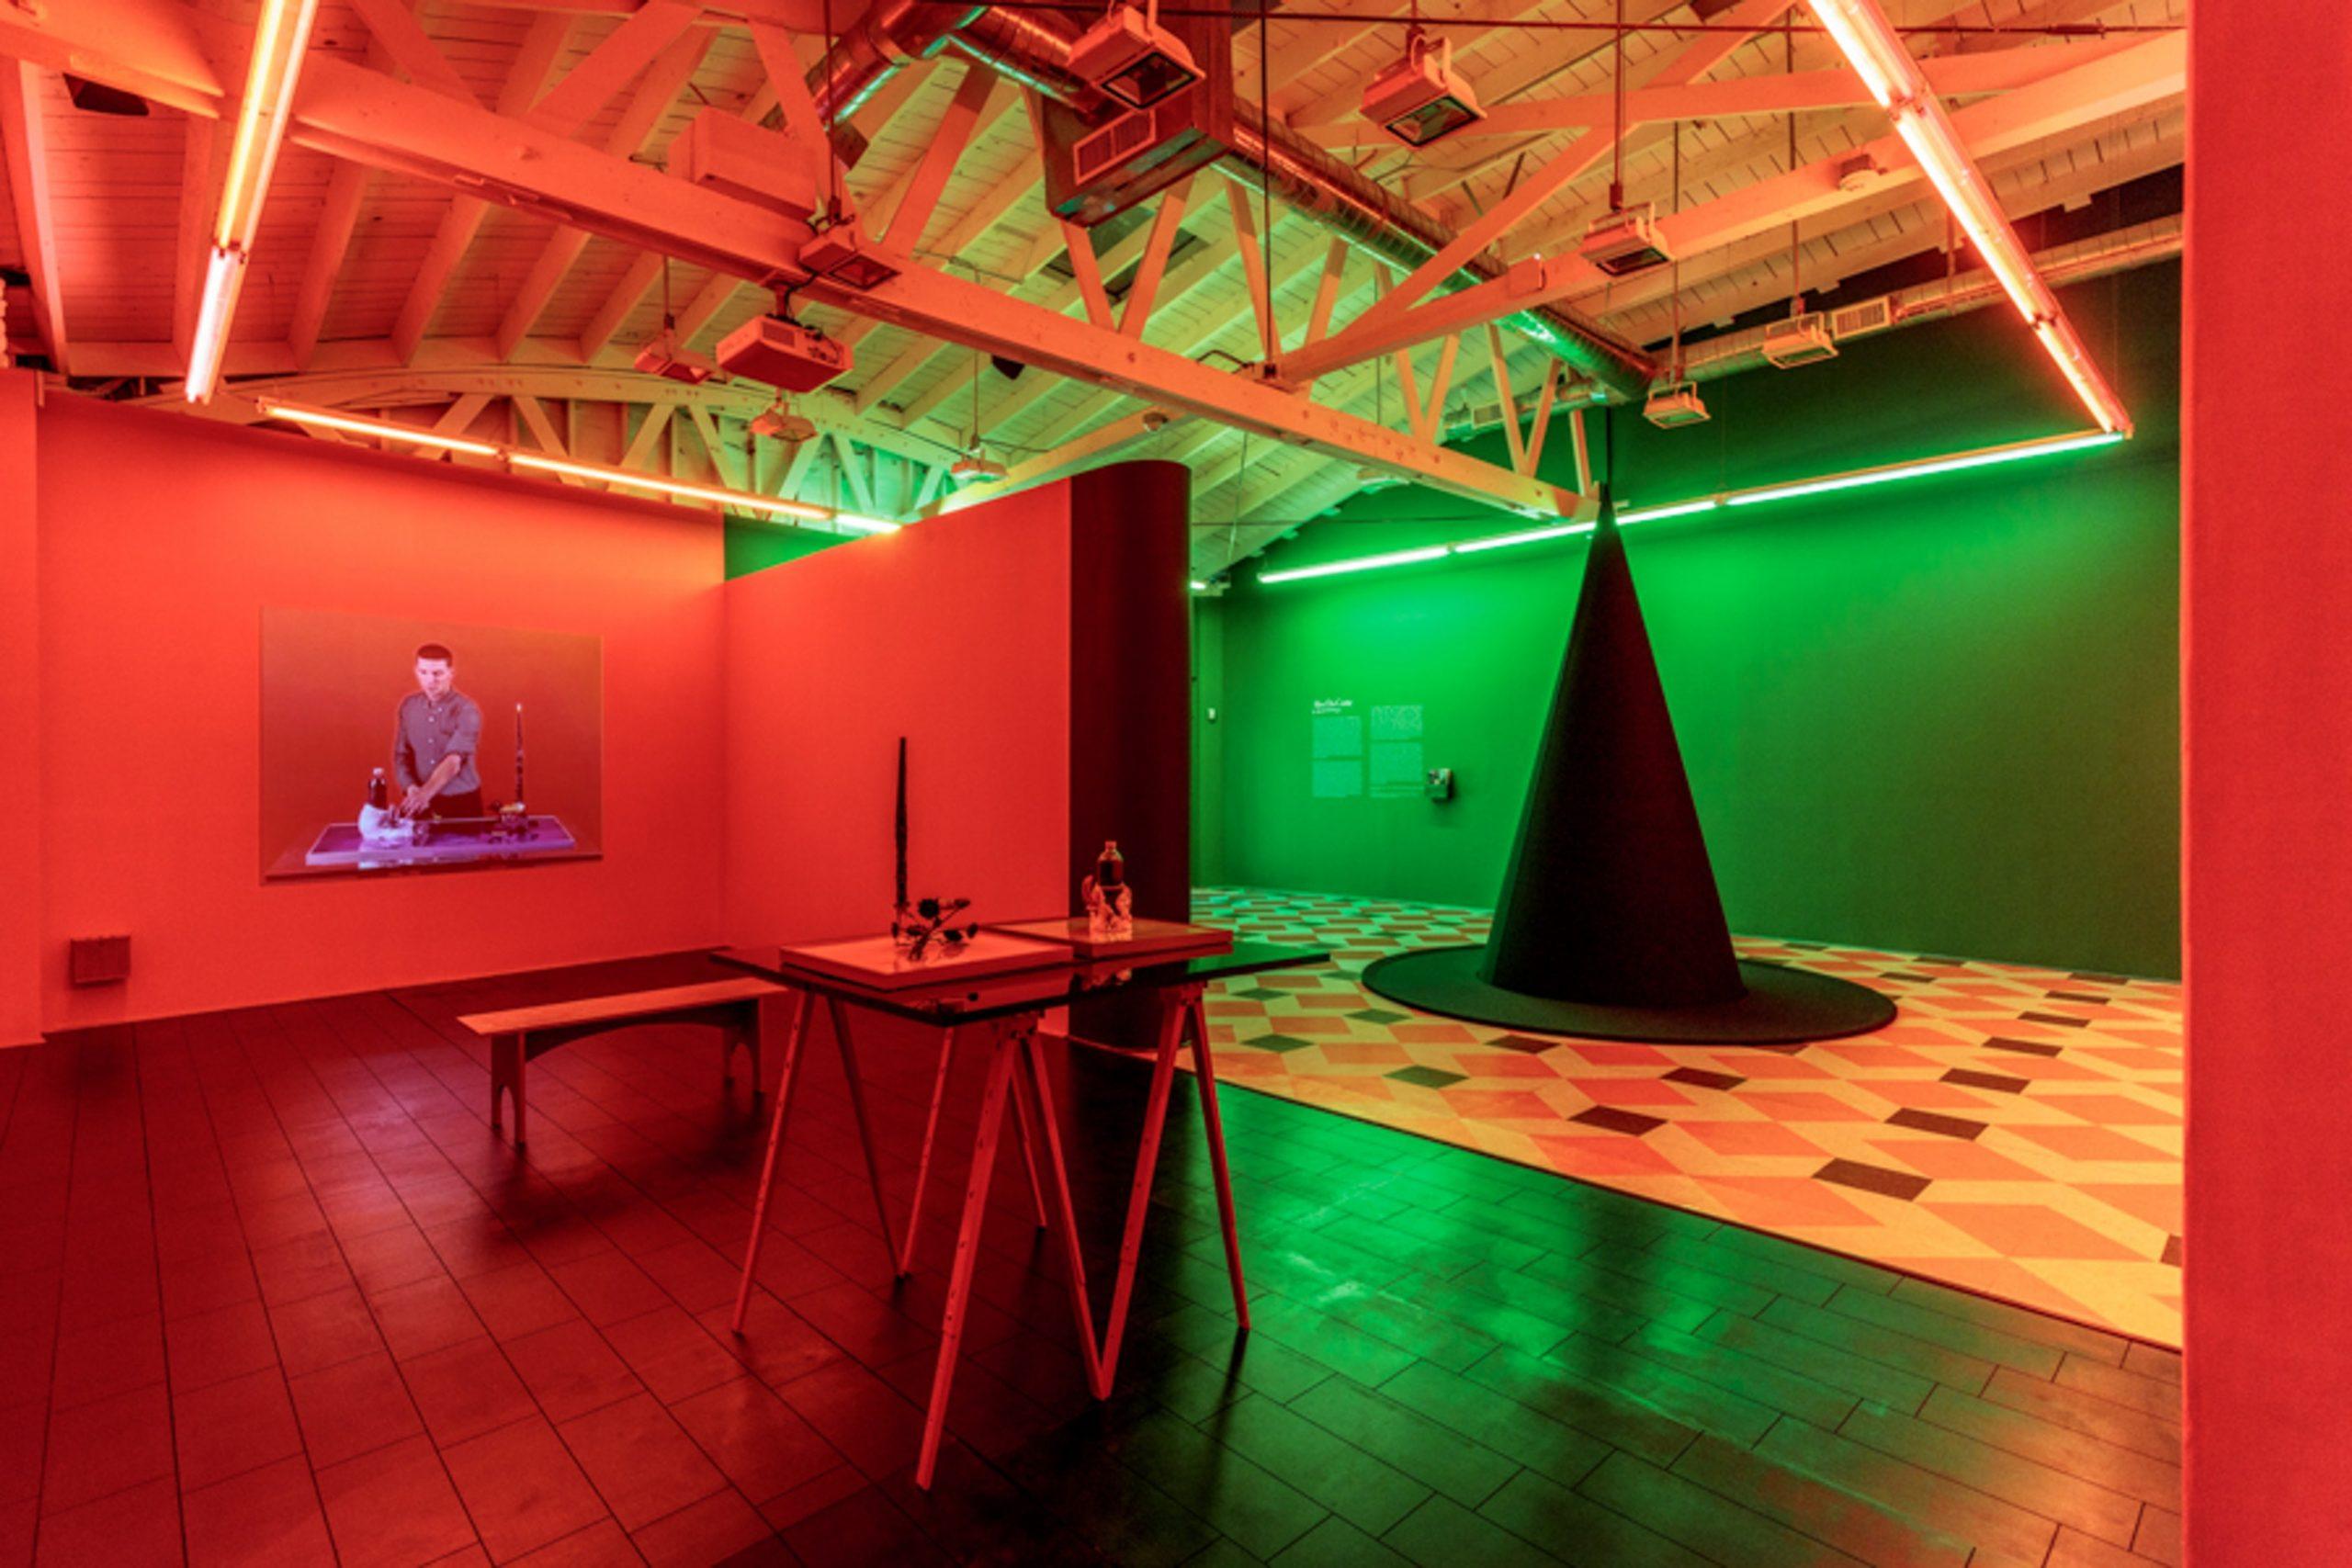 Alex Da Corte: A Season in He'll, installation view. Art + Practice, Los Angeles. July 9 - September 17, 2016. Photo by Joshua White.